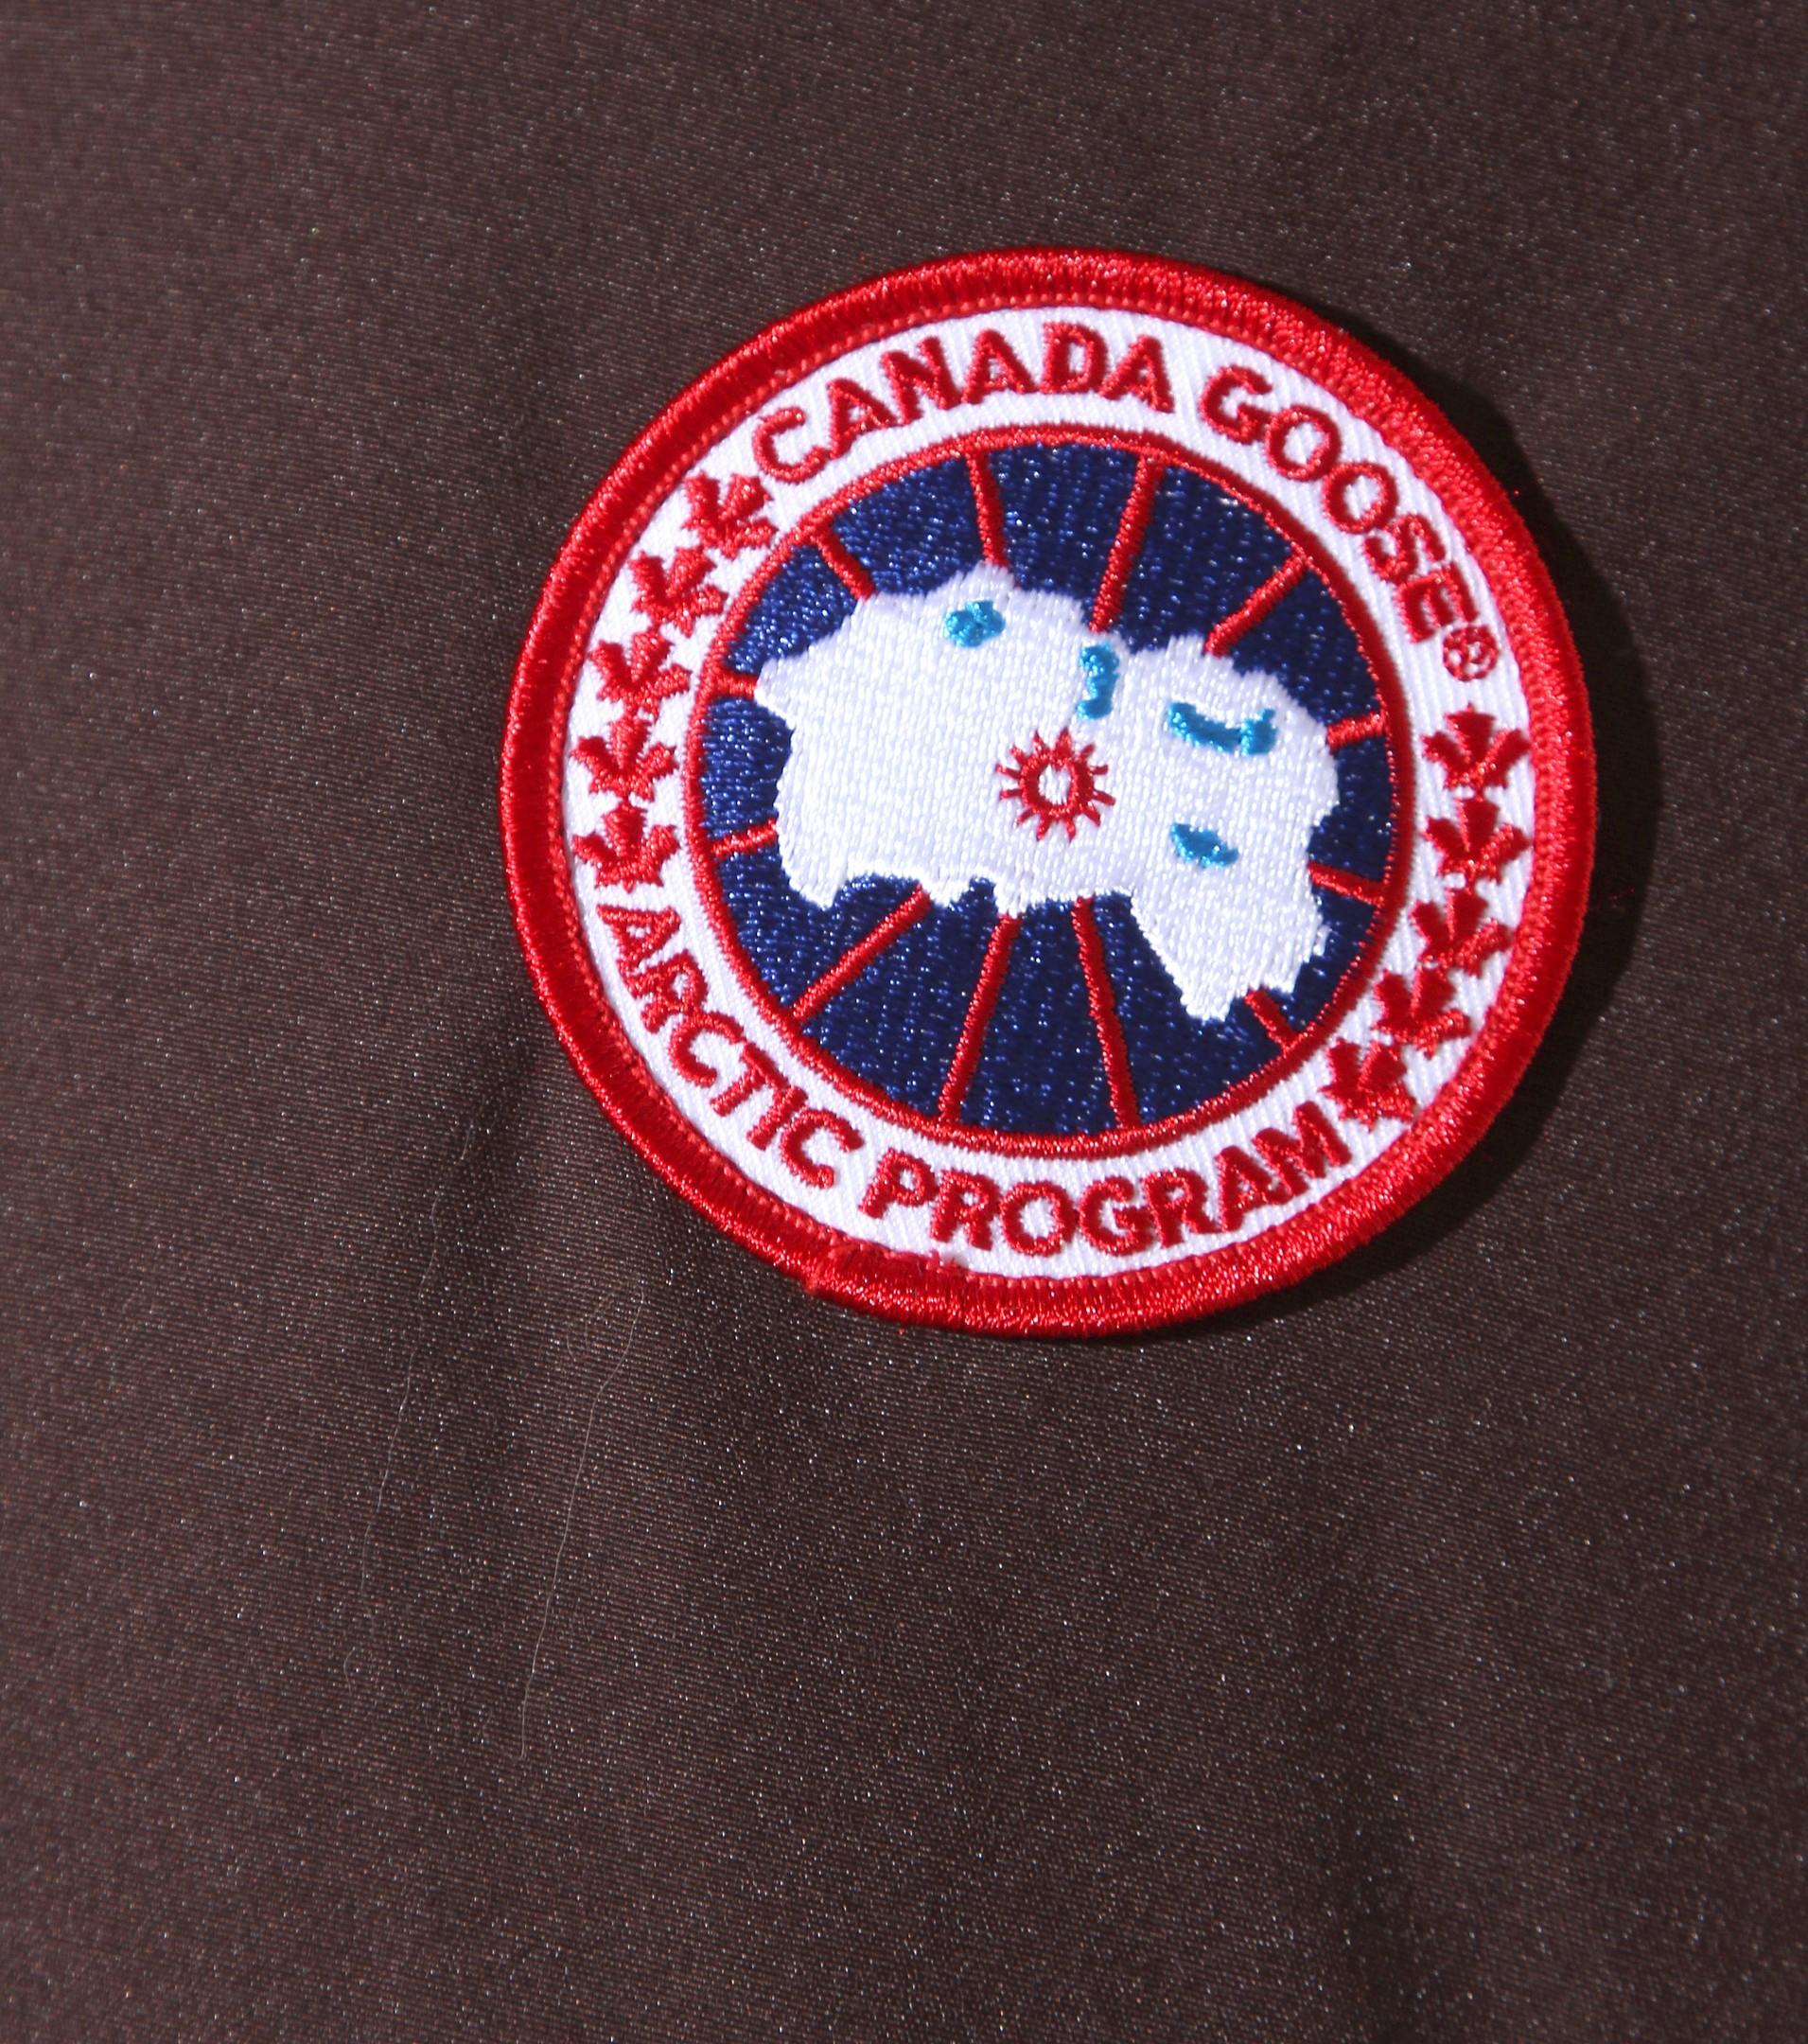 canada goose jackets logo